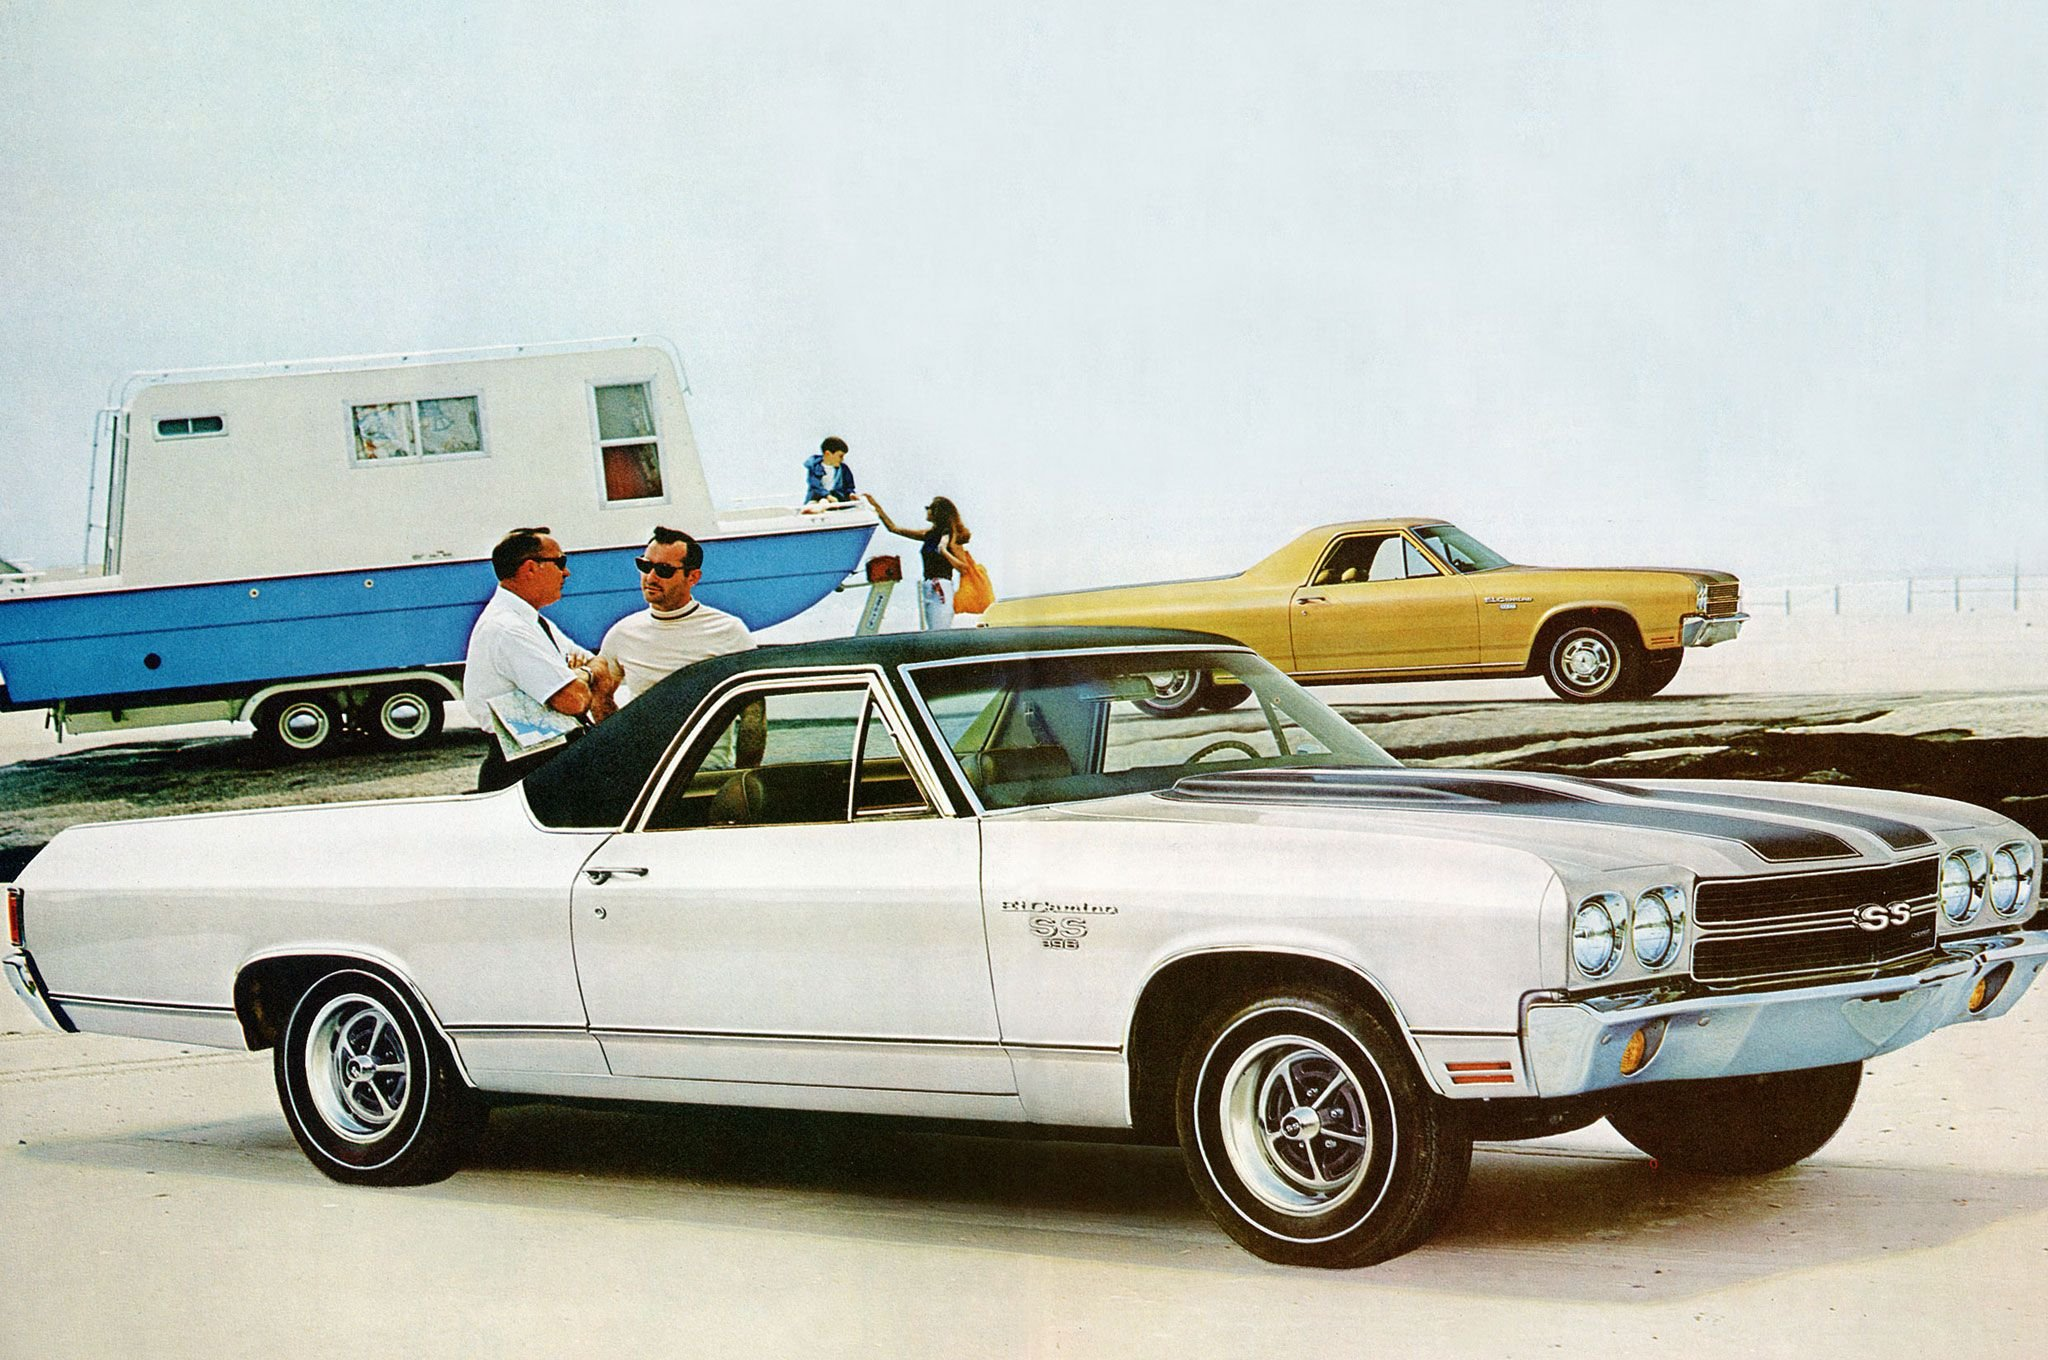 1970 Chevrolet Chevelle El Camino-01 wallpaper